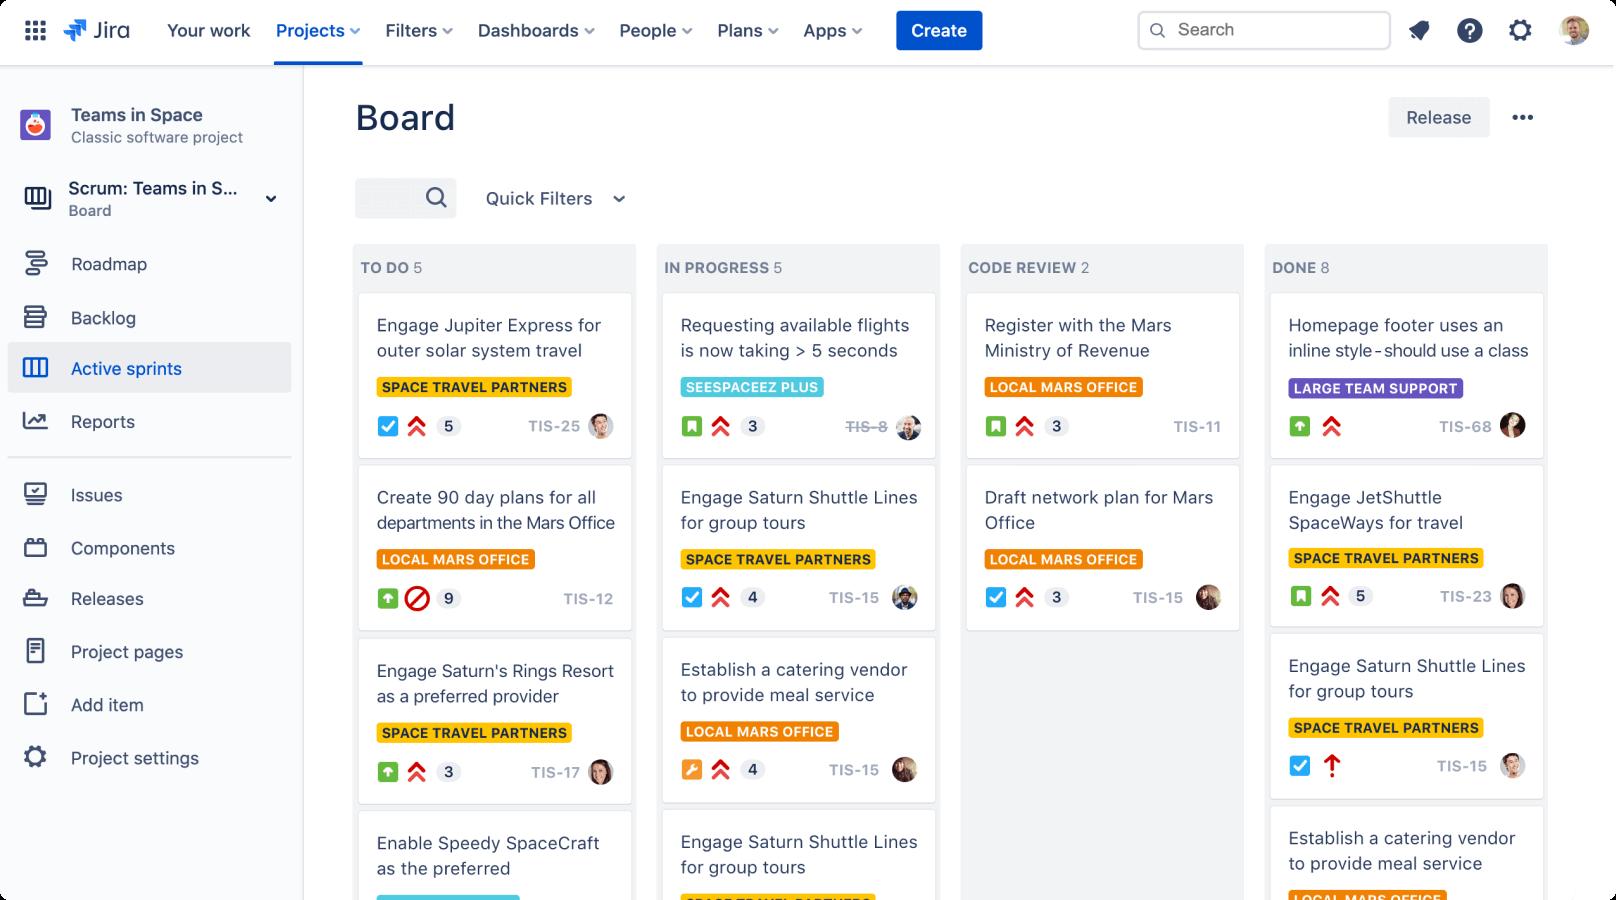 Agile tool for Atlassian users - JIRA